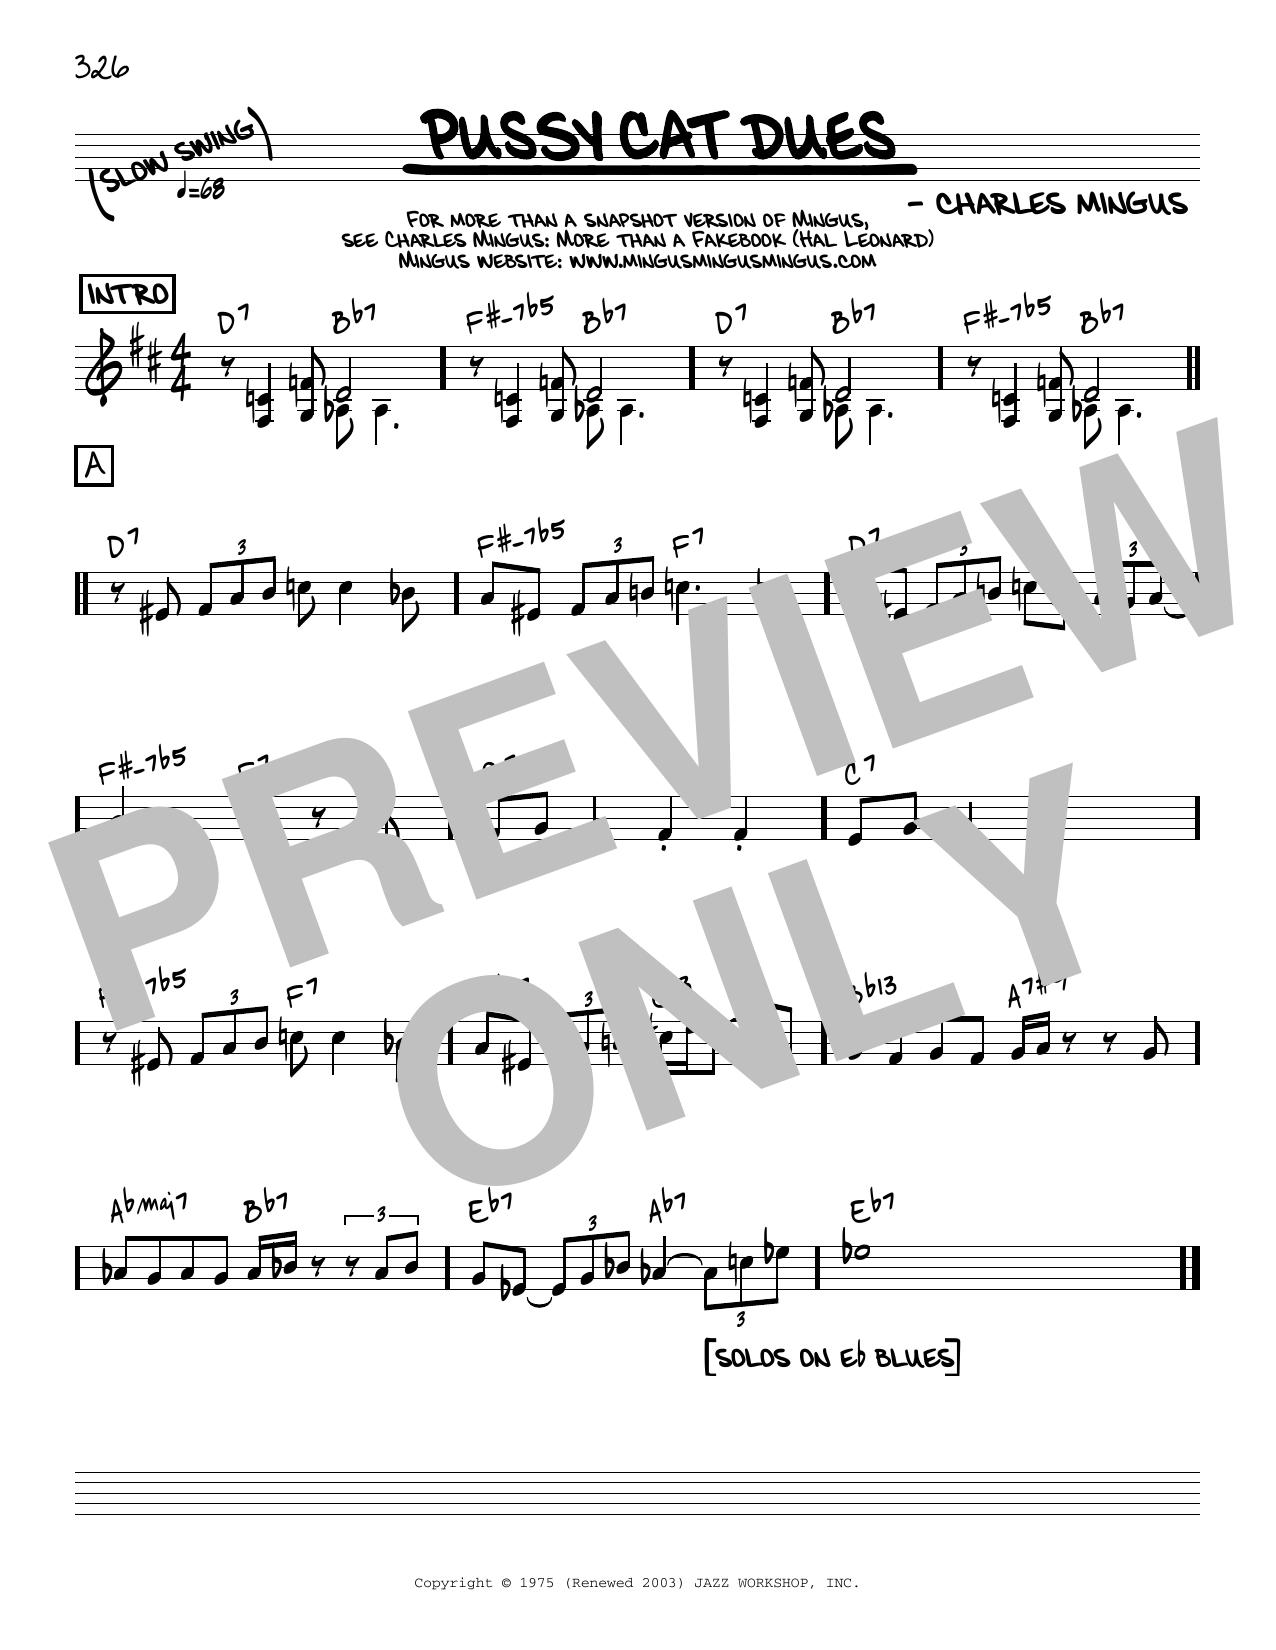 Charles Mingus Pussy Cat Dues [Reharmonized version] (arr. Jack Grassel) sheet music notes printable PDF score